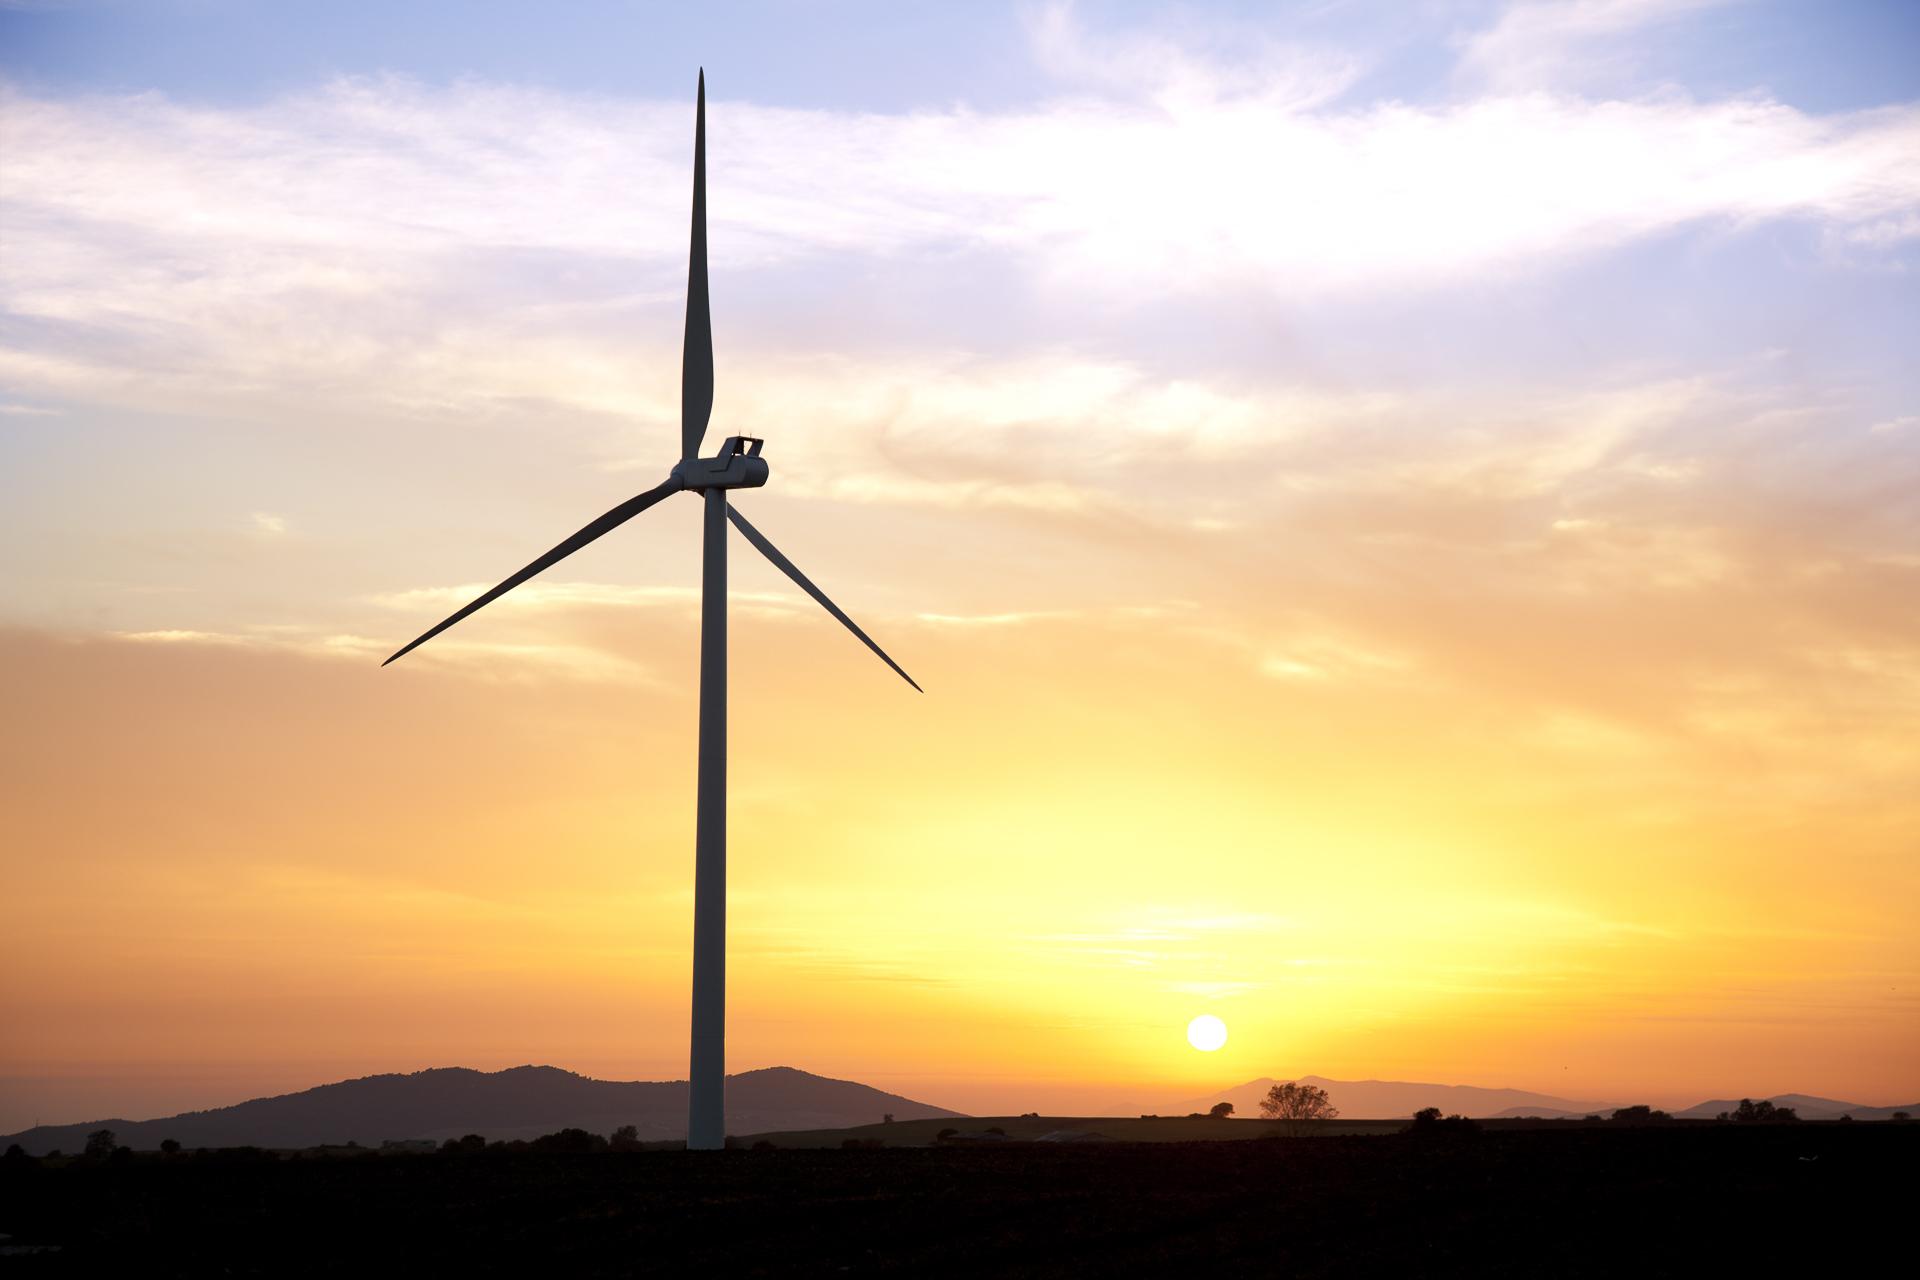 Impianto produzione energie elettrica eolica rinnovabile Tarifa